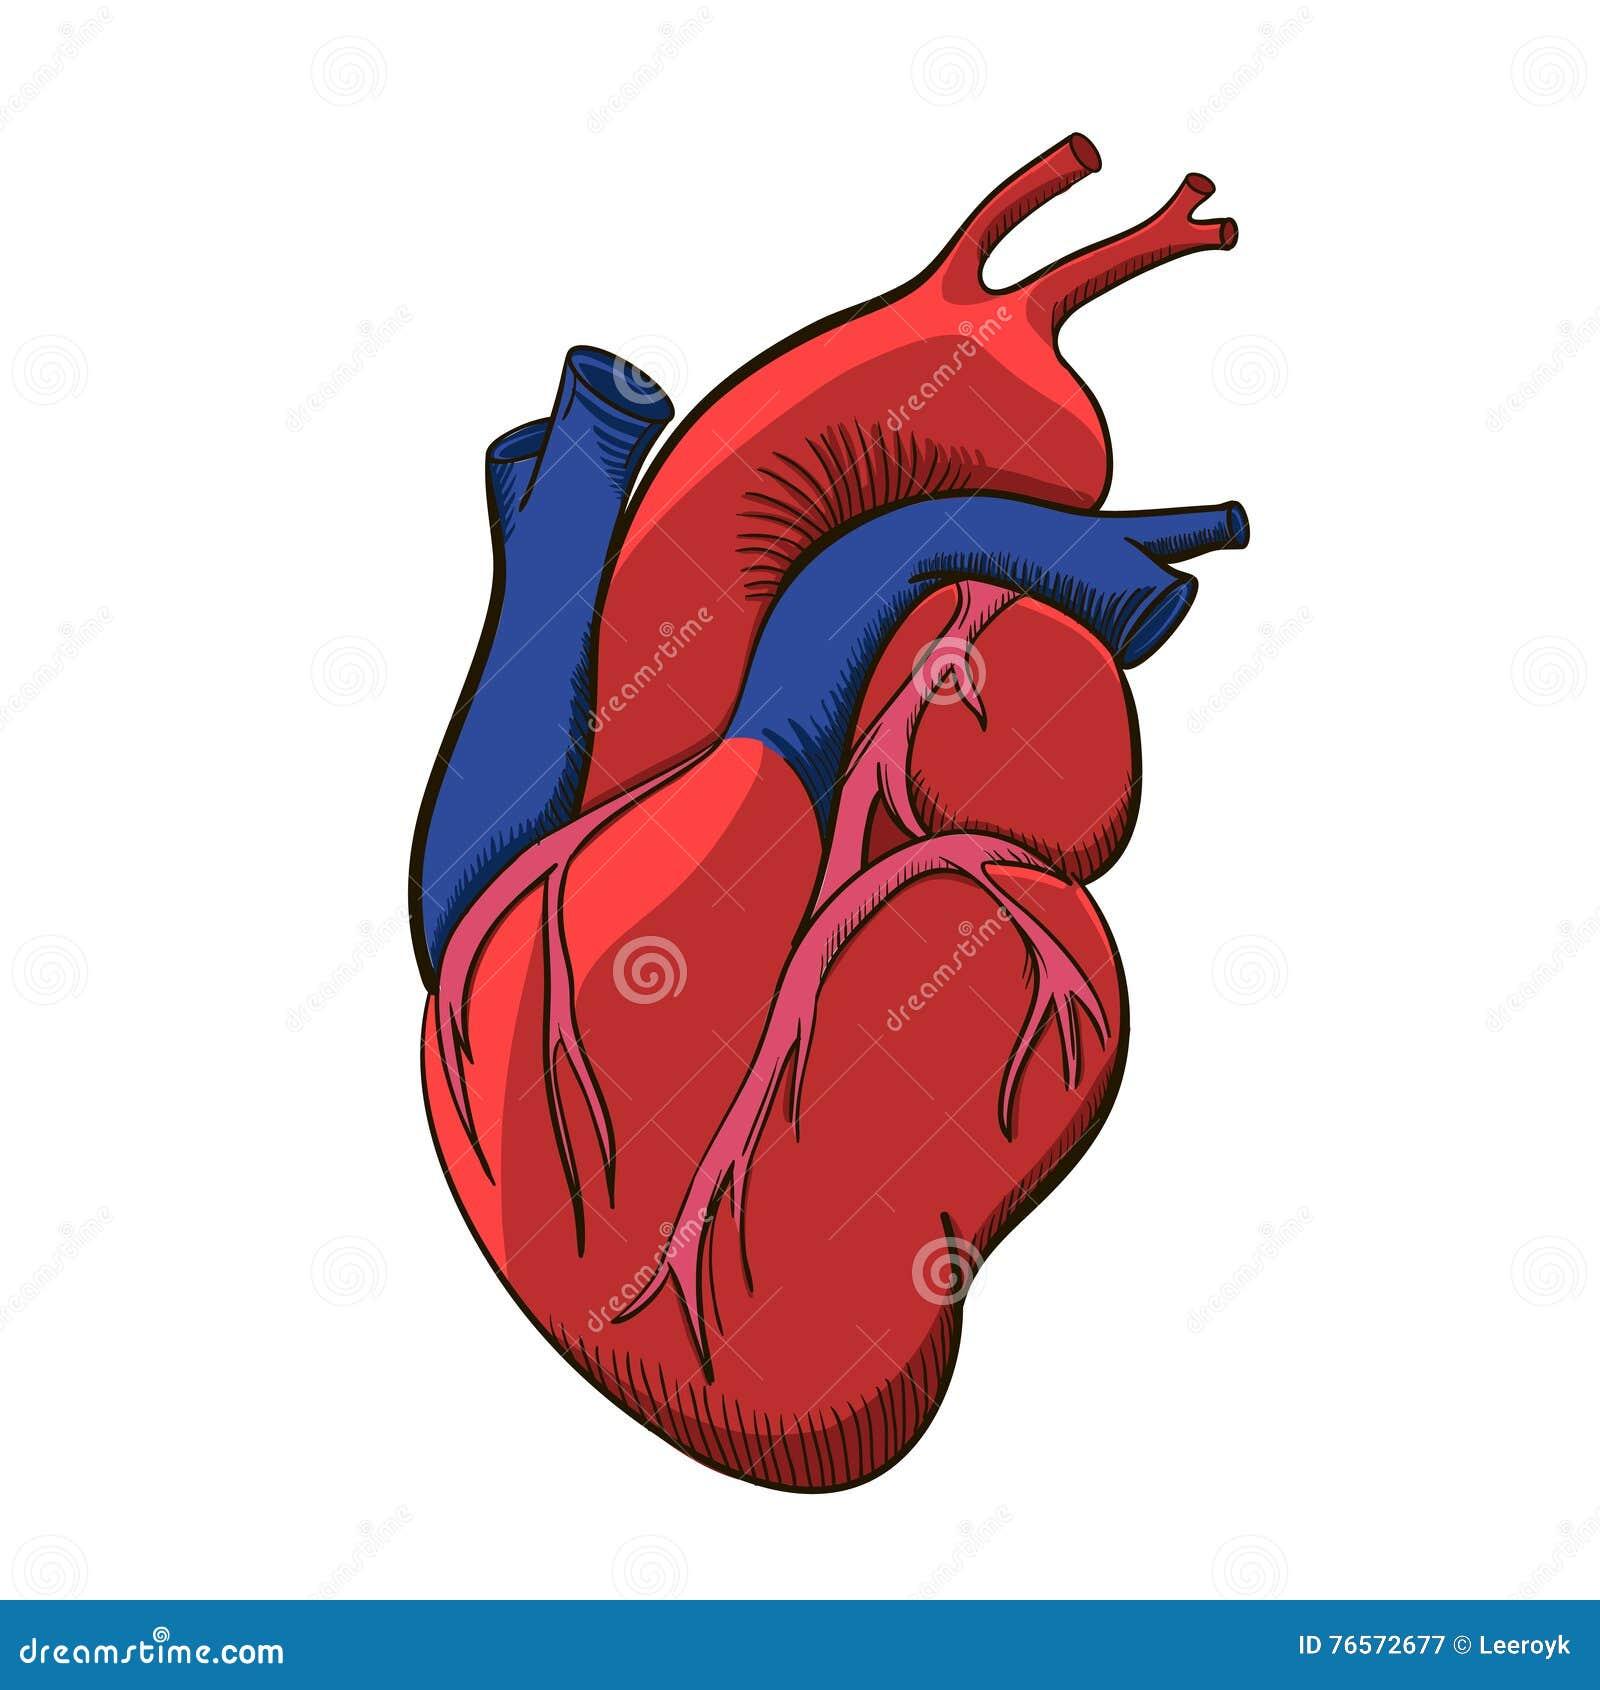 Human Heart Illustration Stock Vector Illustration Of Pulmonary